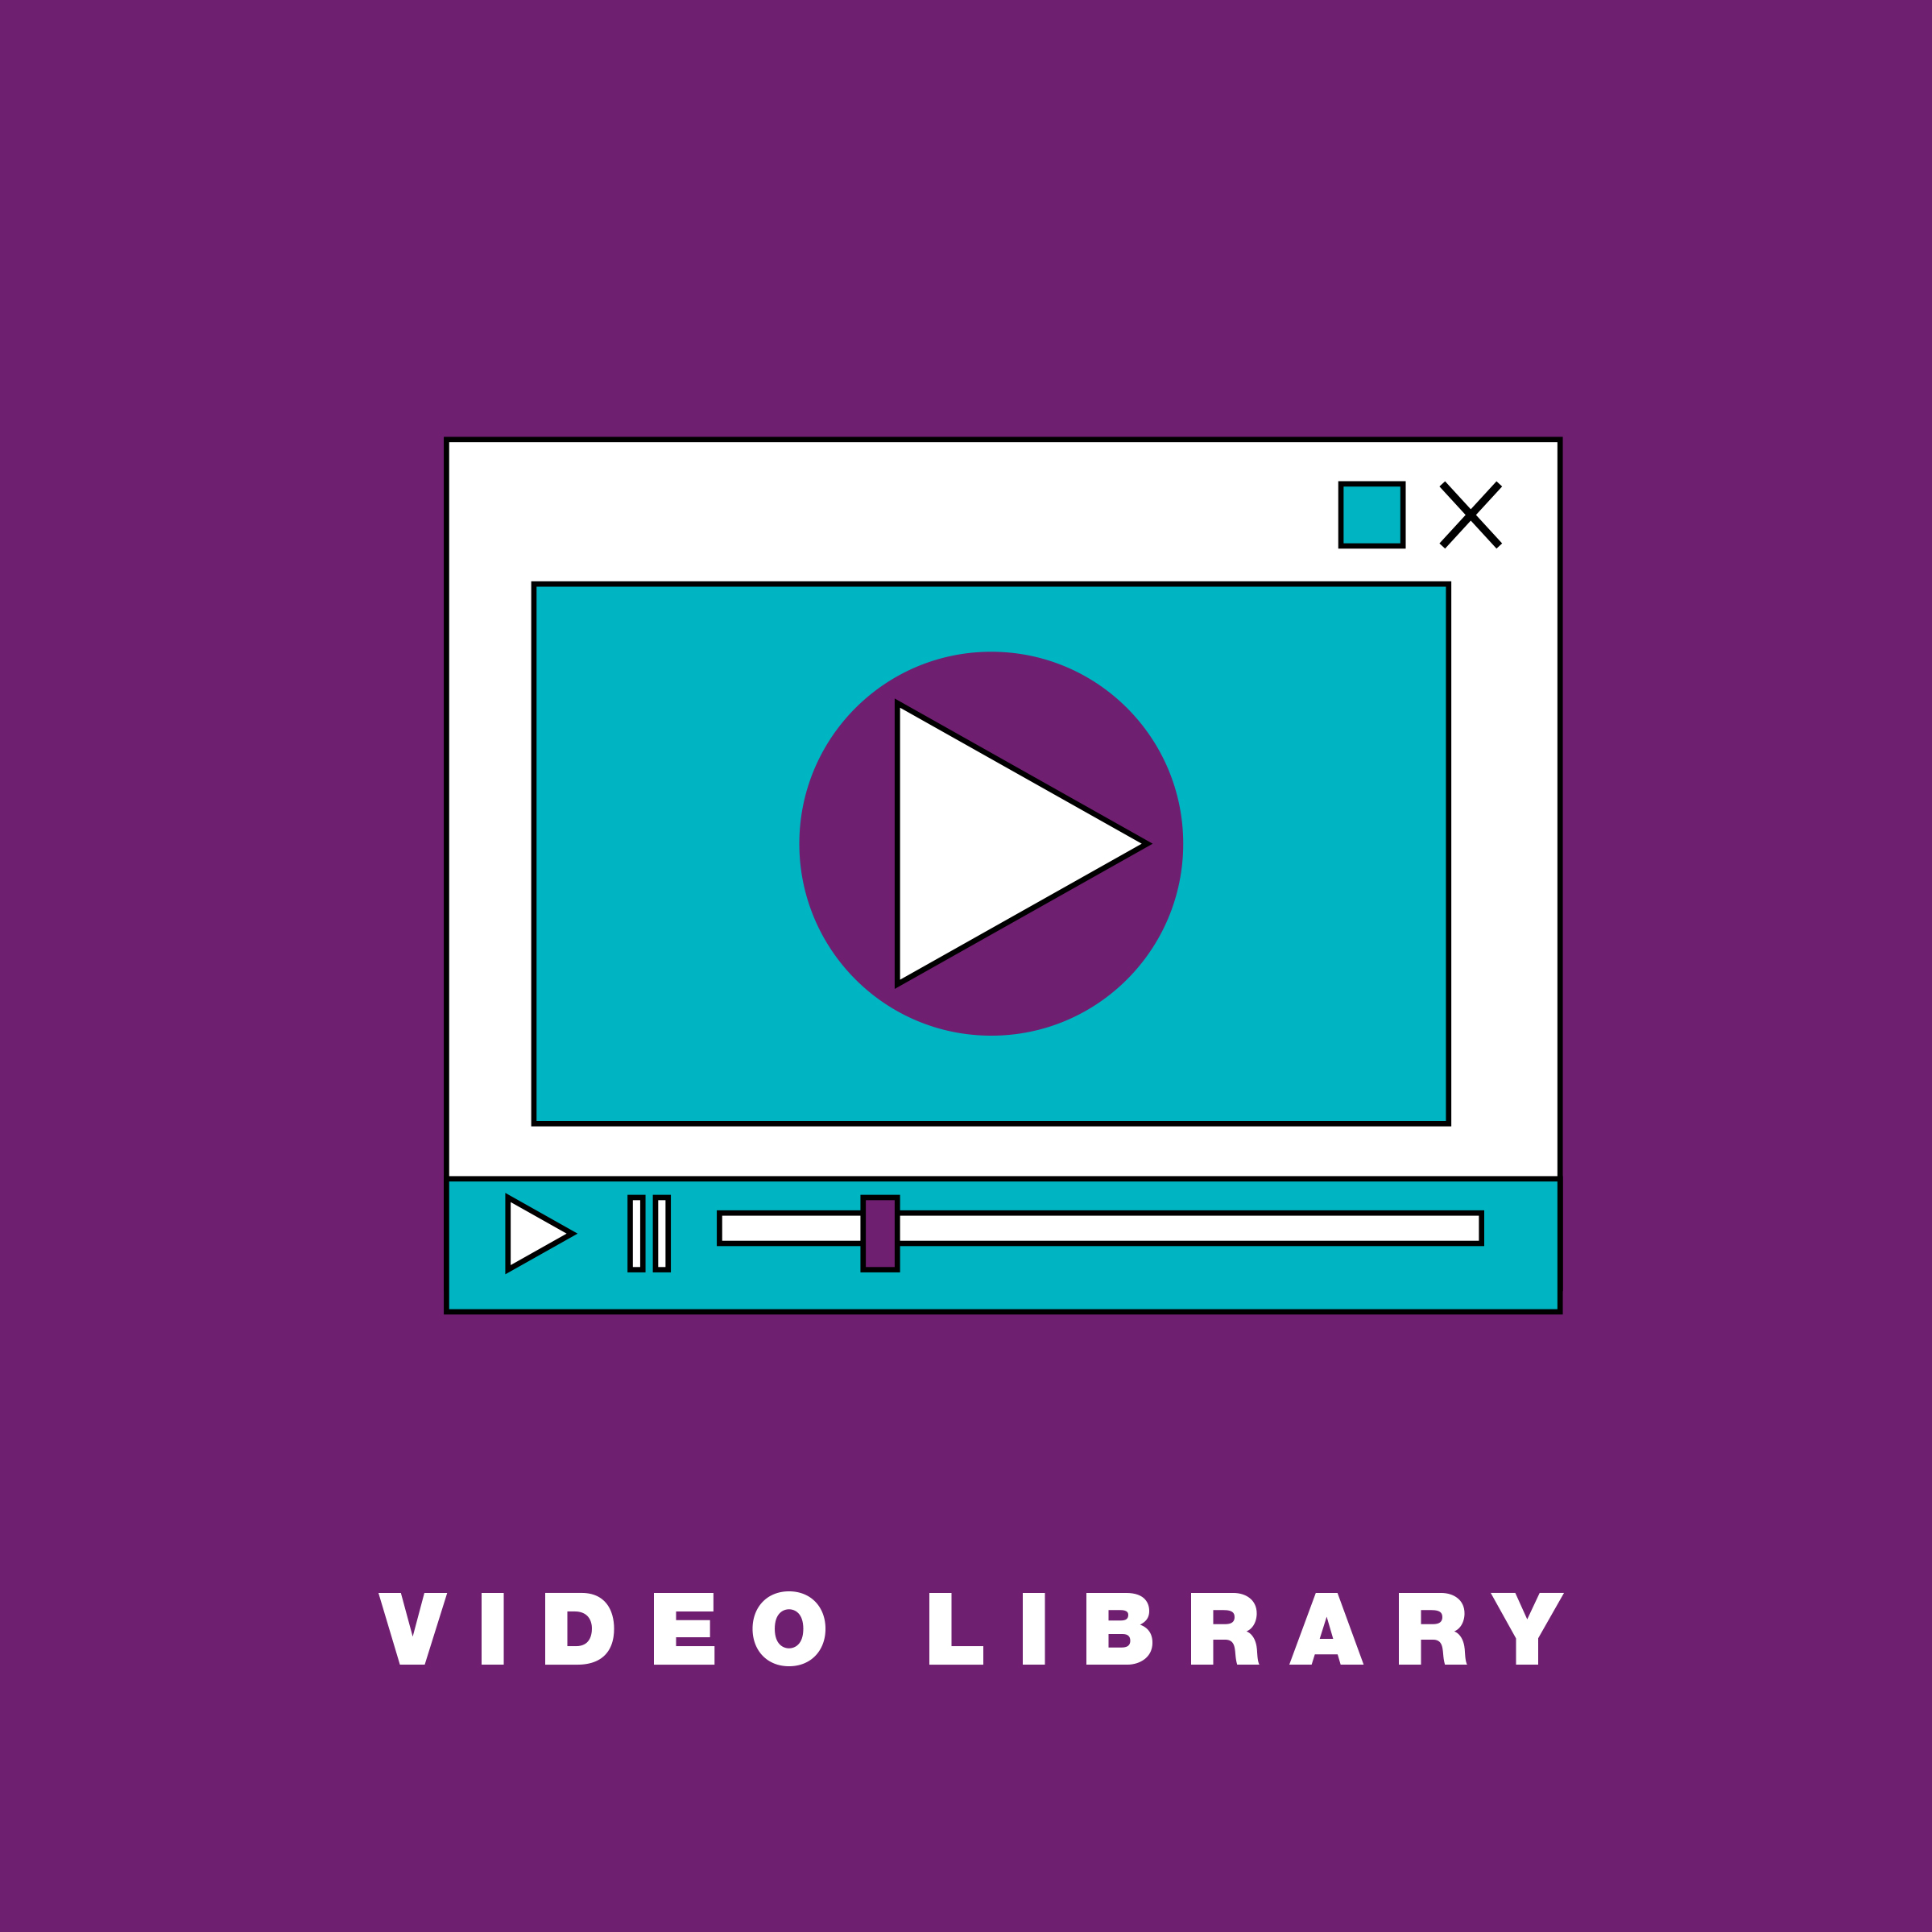 VIDEO LIBRARY.jpg